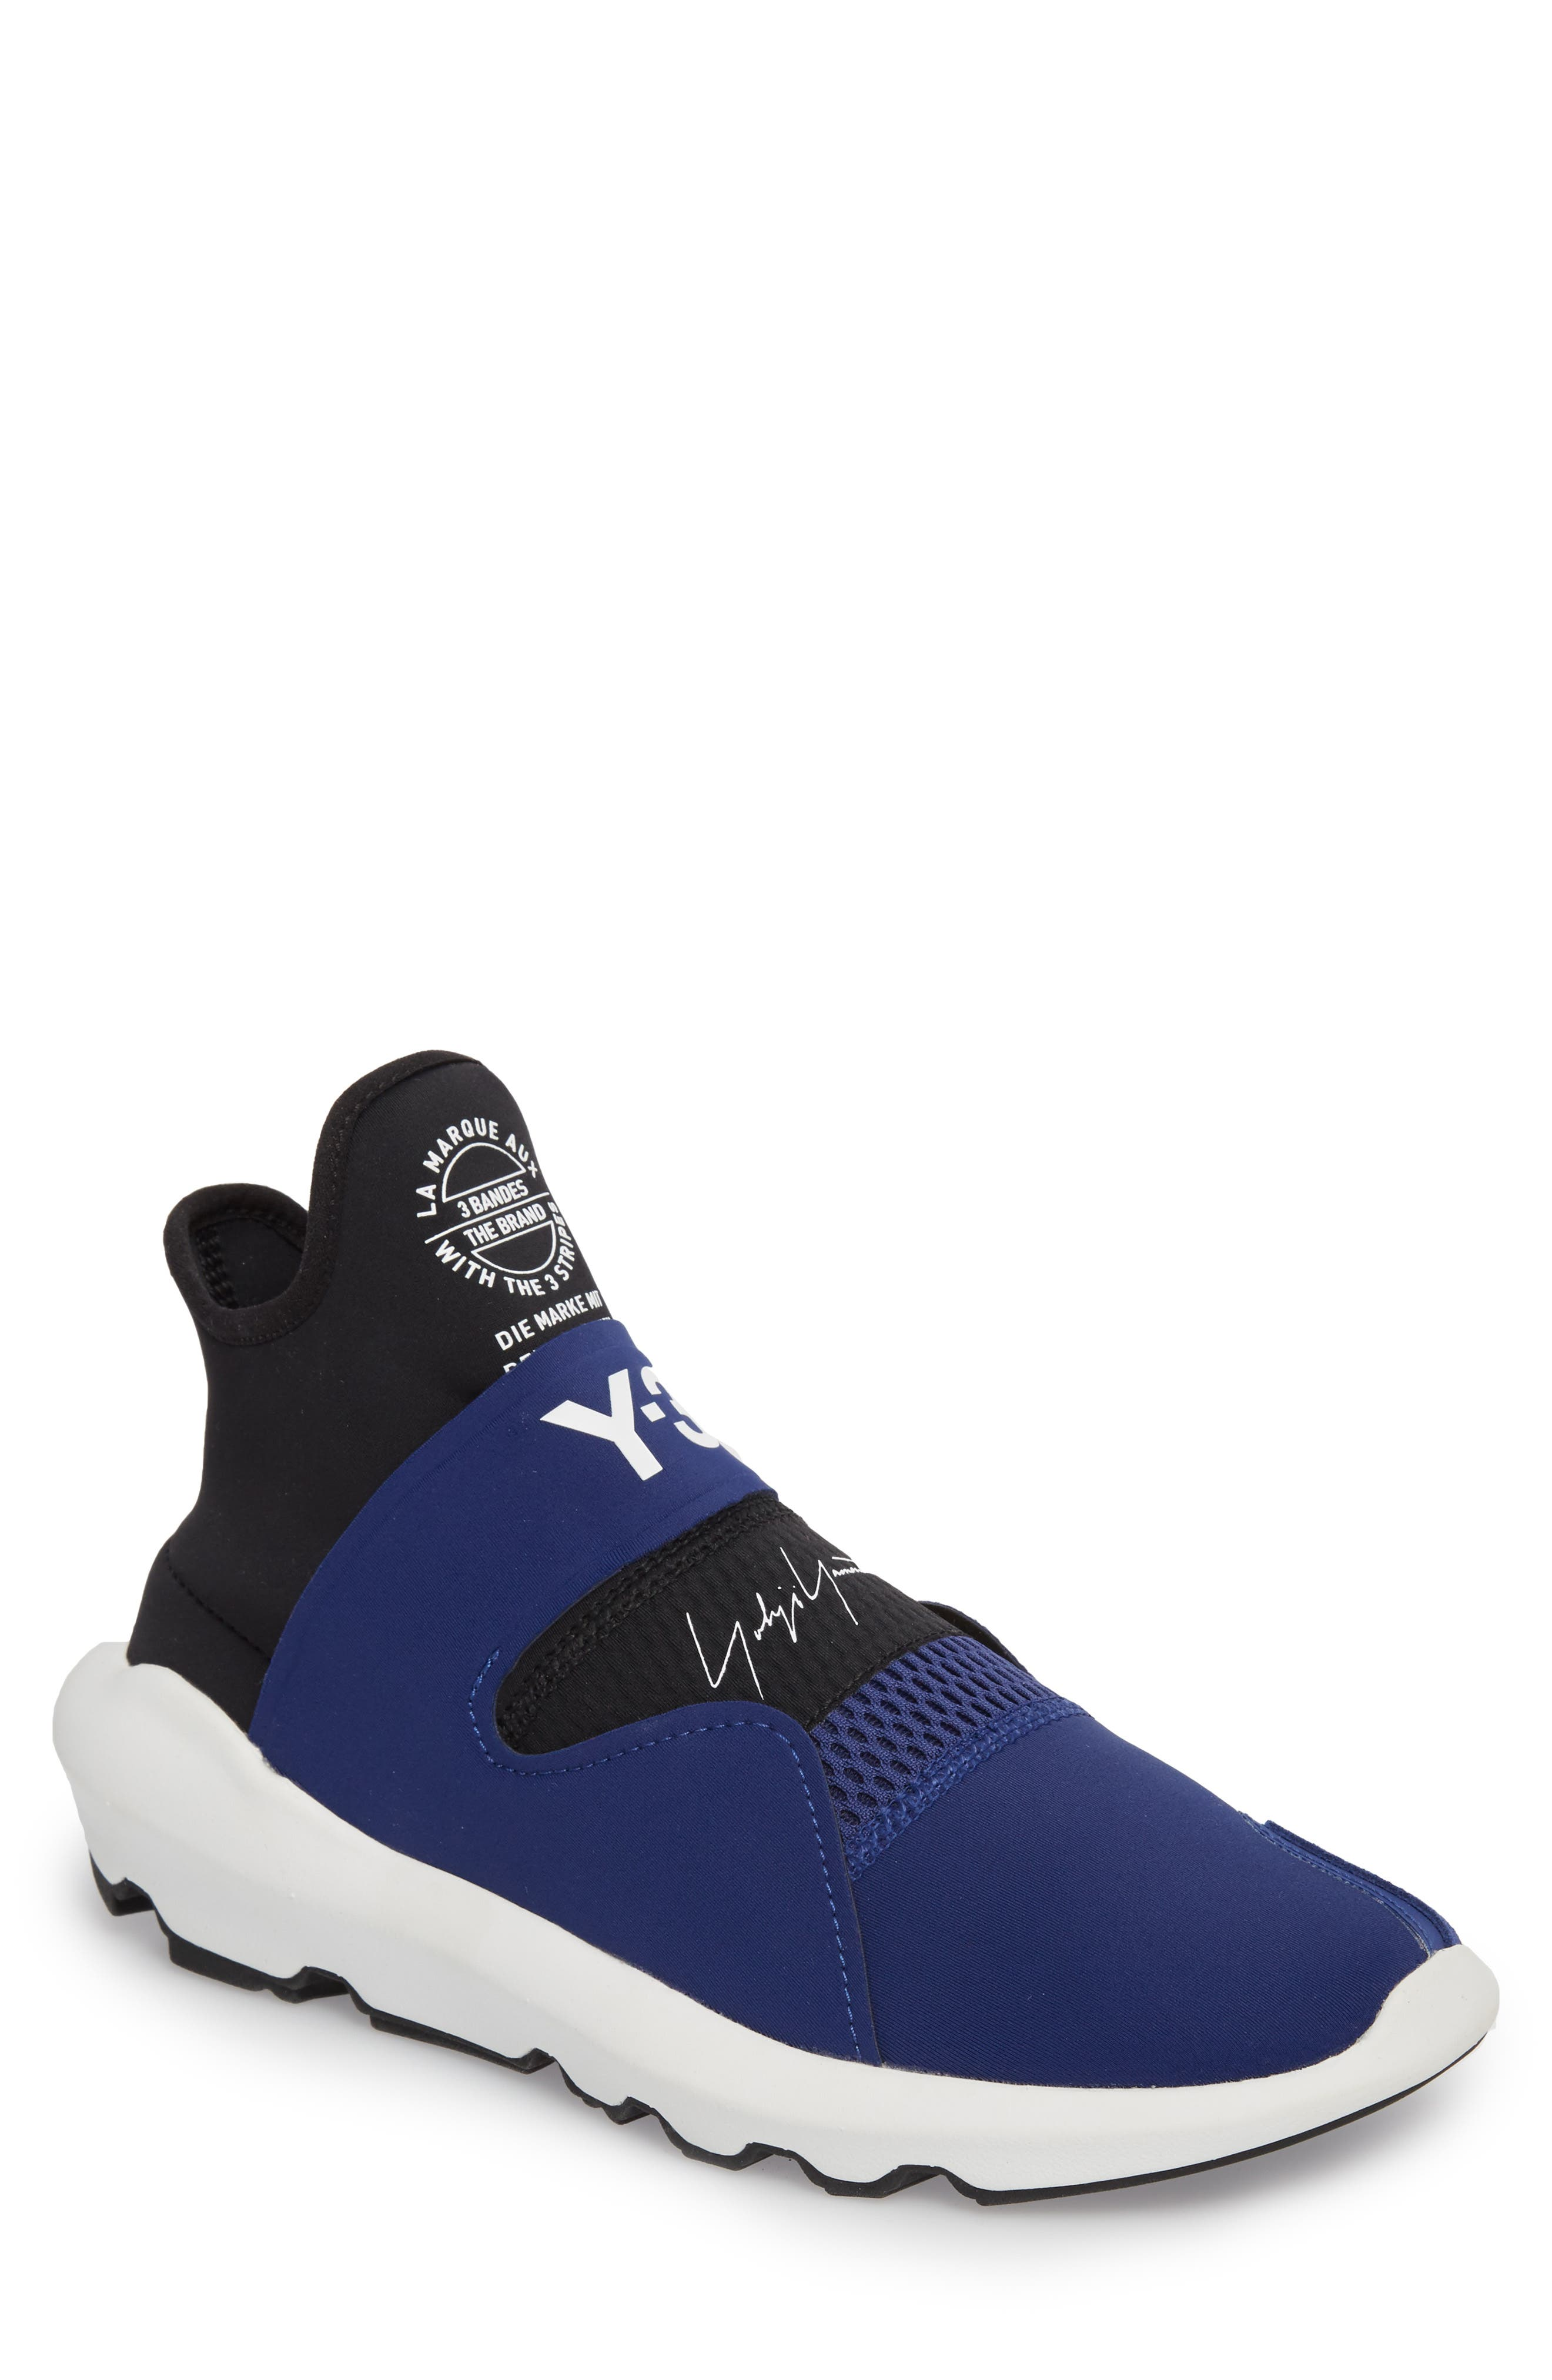 x adidas Suberou Sneaker,                             Main thumbnail 1, color,                             Unity Ink